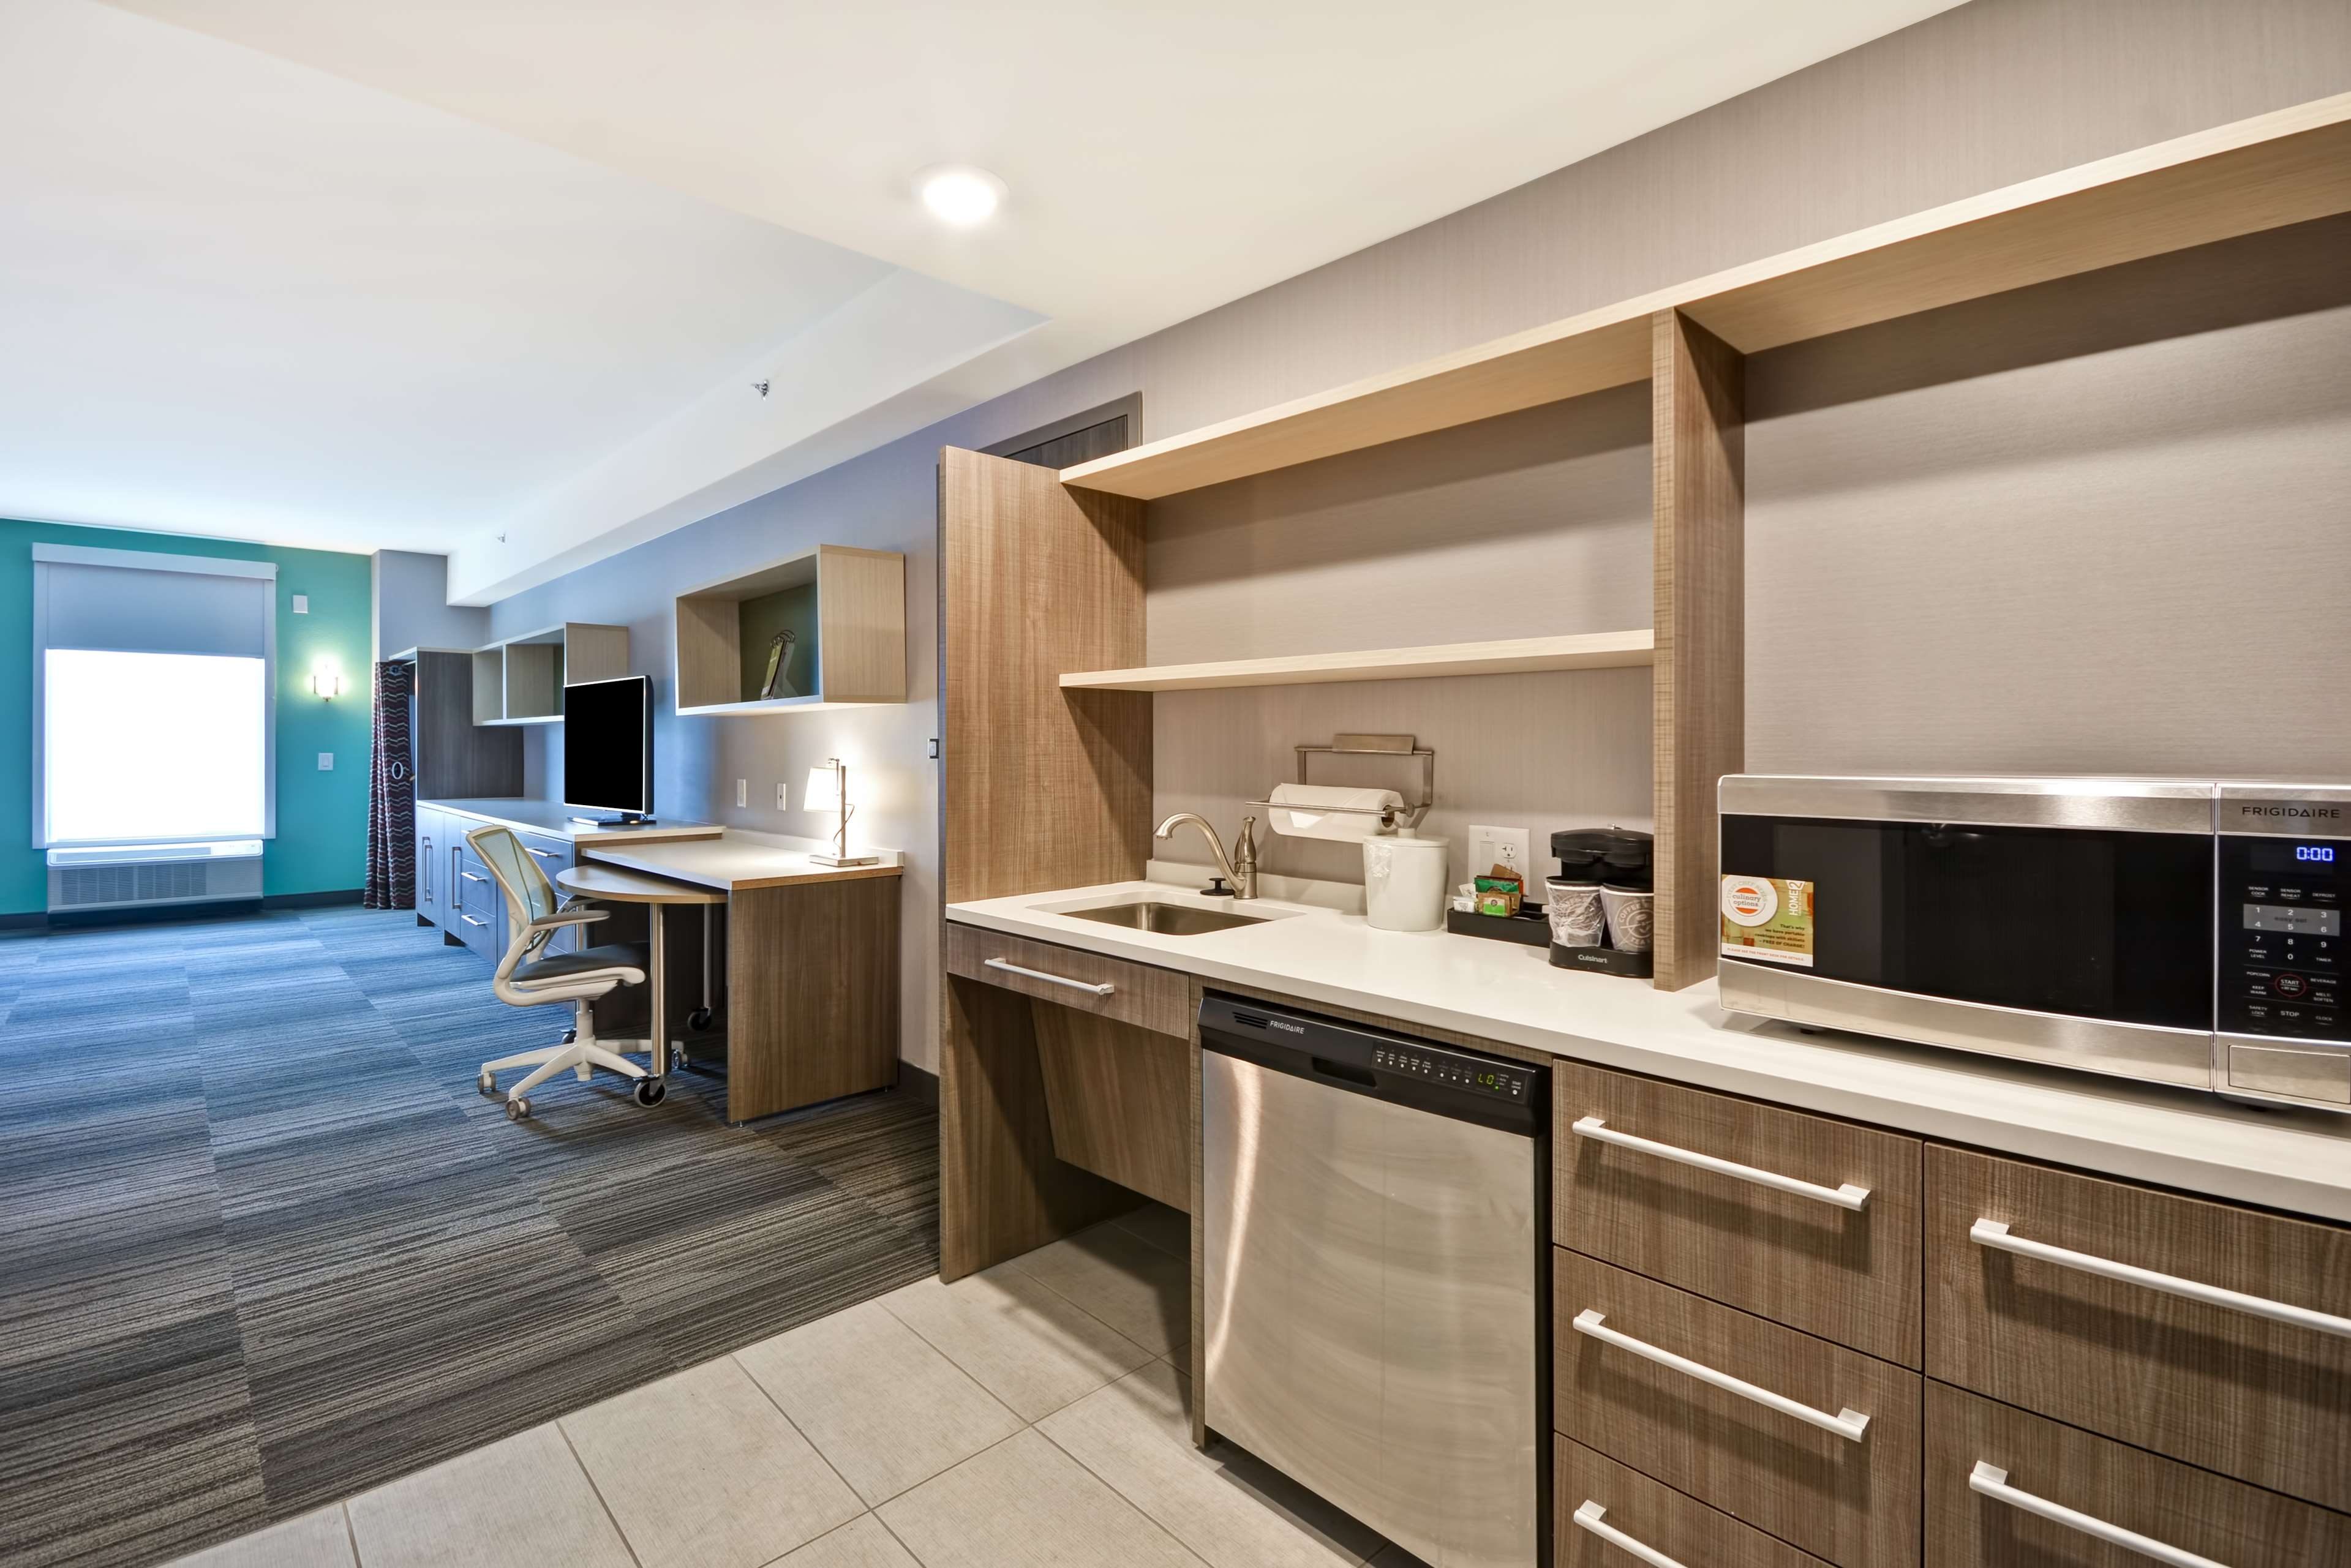 Home2 Suites by Hilton Atlanta West Lithia Springs image 34